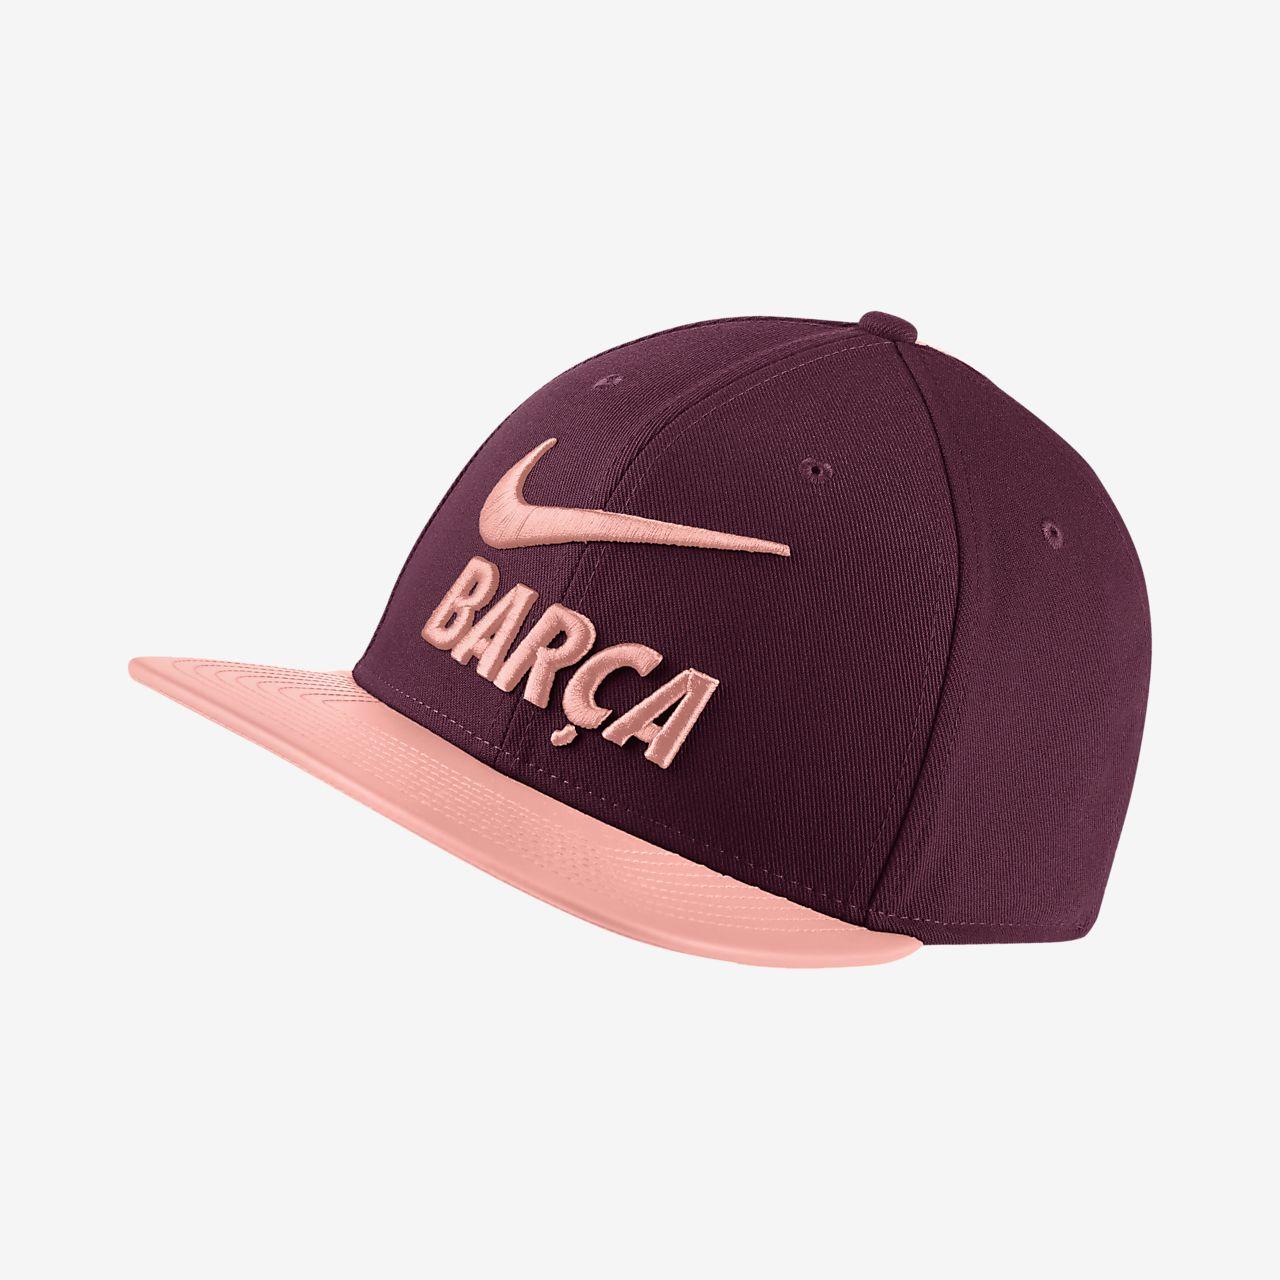 FC Barcelona Verstellbare Kappe